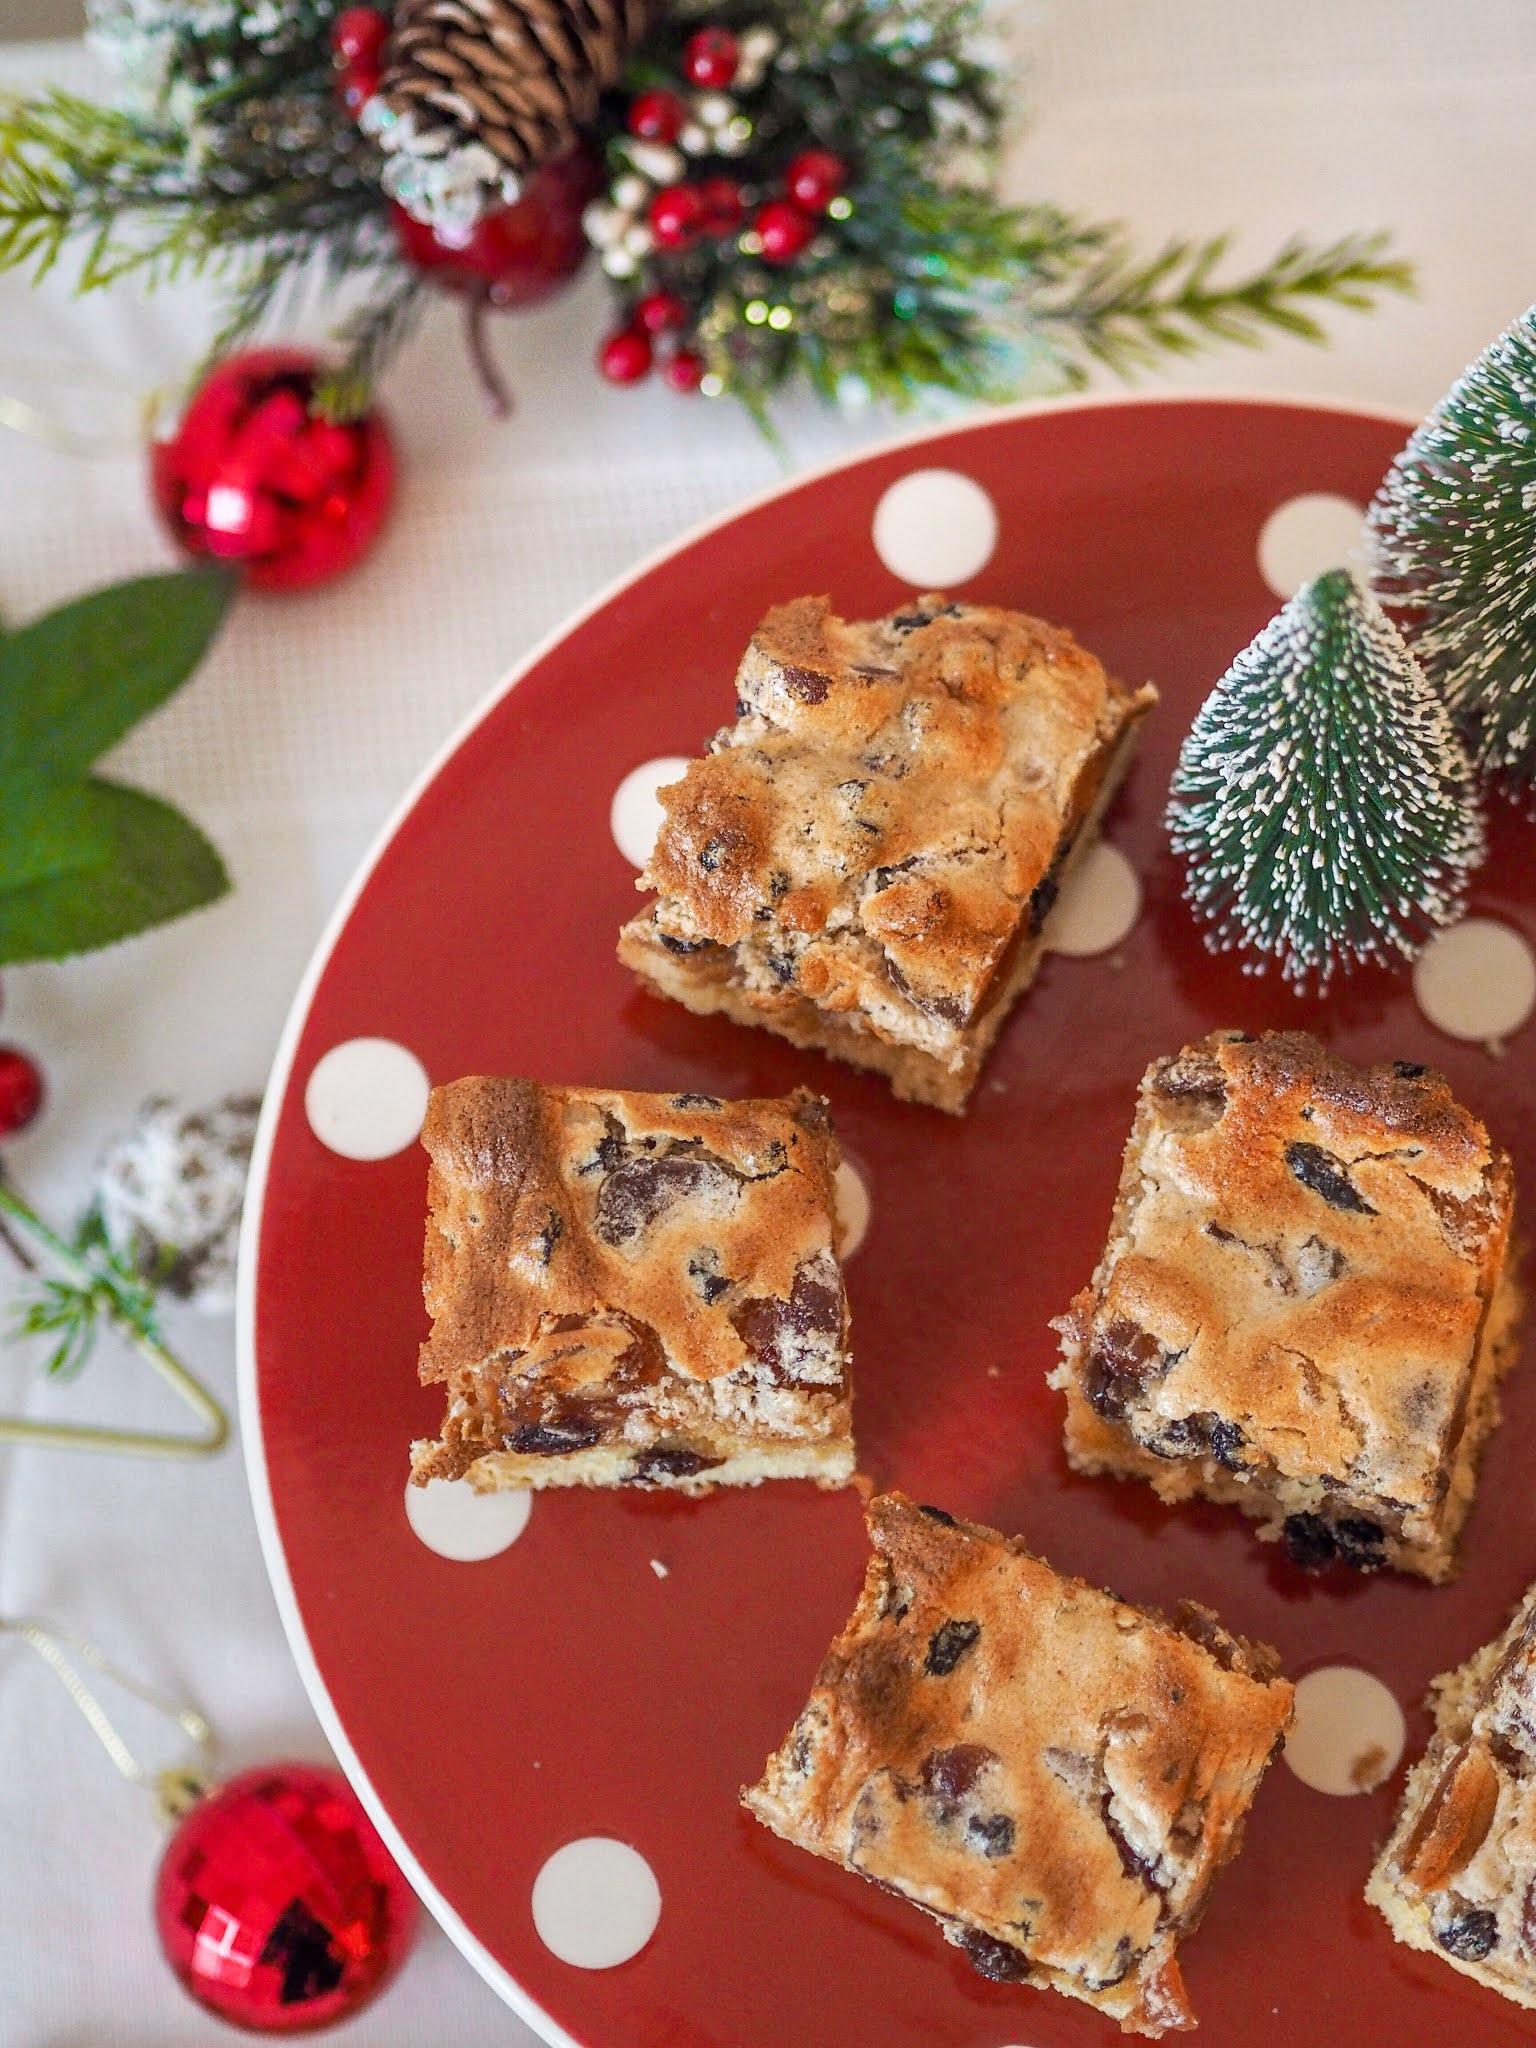 Mince Pie Shortcake Bites, Food Blogger, Katie Kirk Loves, UK Blogger, Christmas Recipe, Christmas Baking, Homemade Christmas Gifts, Home Baking, UK Baking Blog, UK Recipe